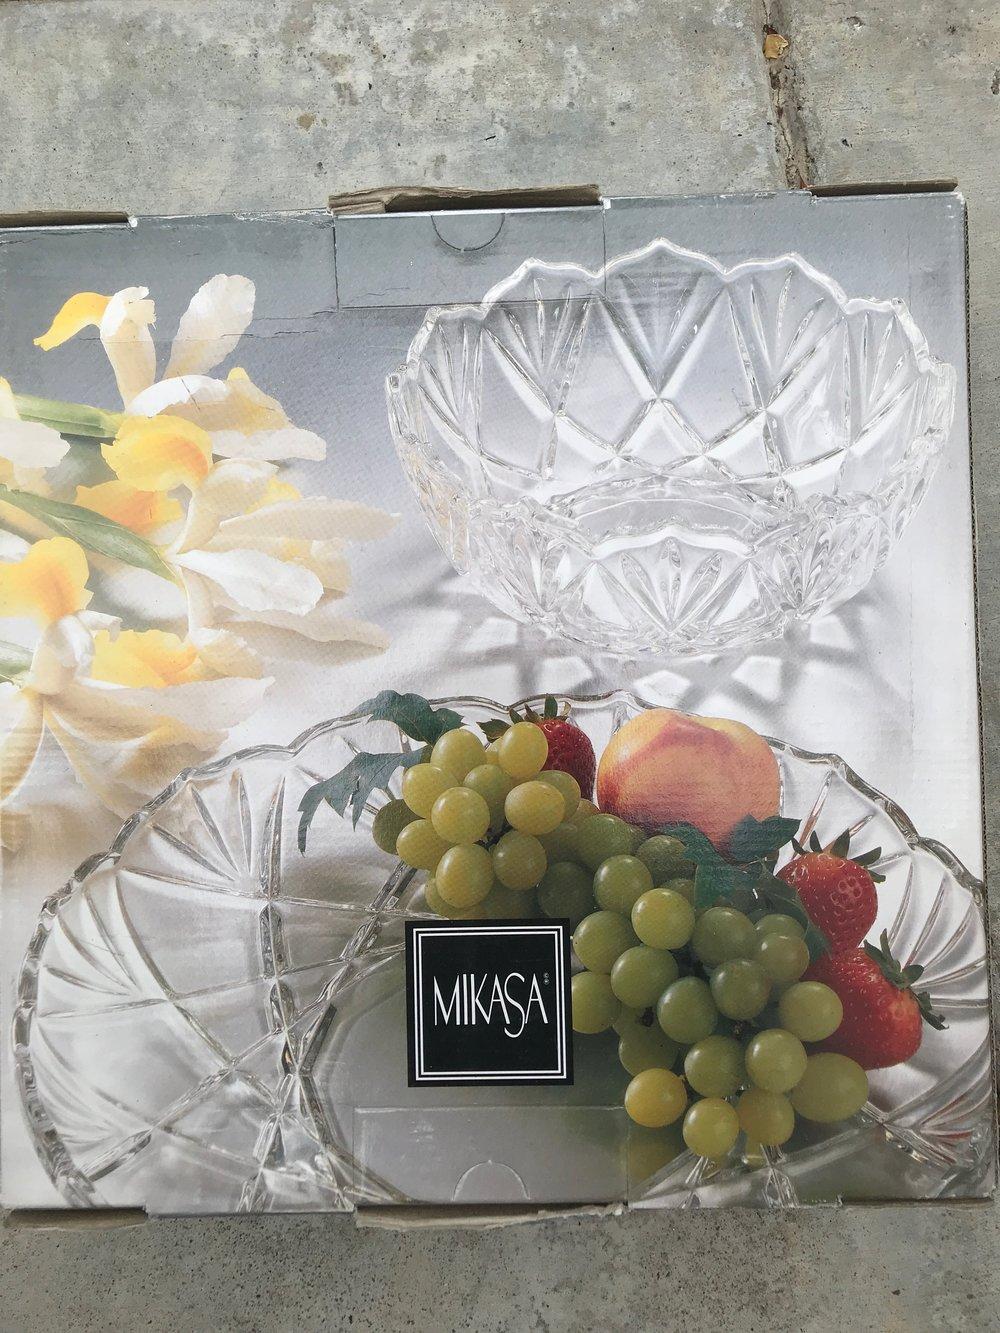 $10 BRAND NEW unopened glass bowl - Perfect wedding gift china.RETAIL: $45